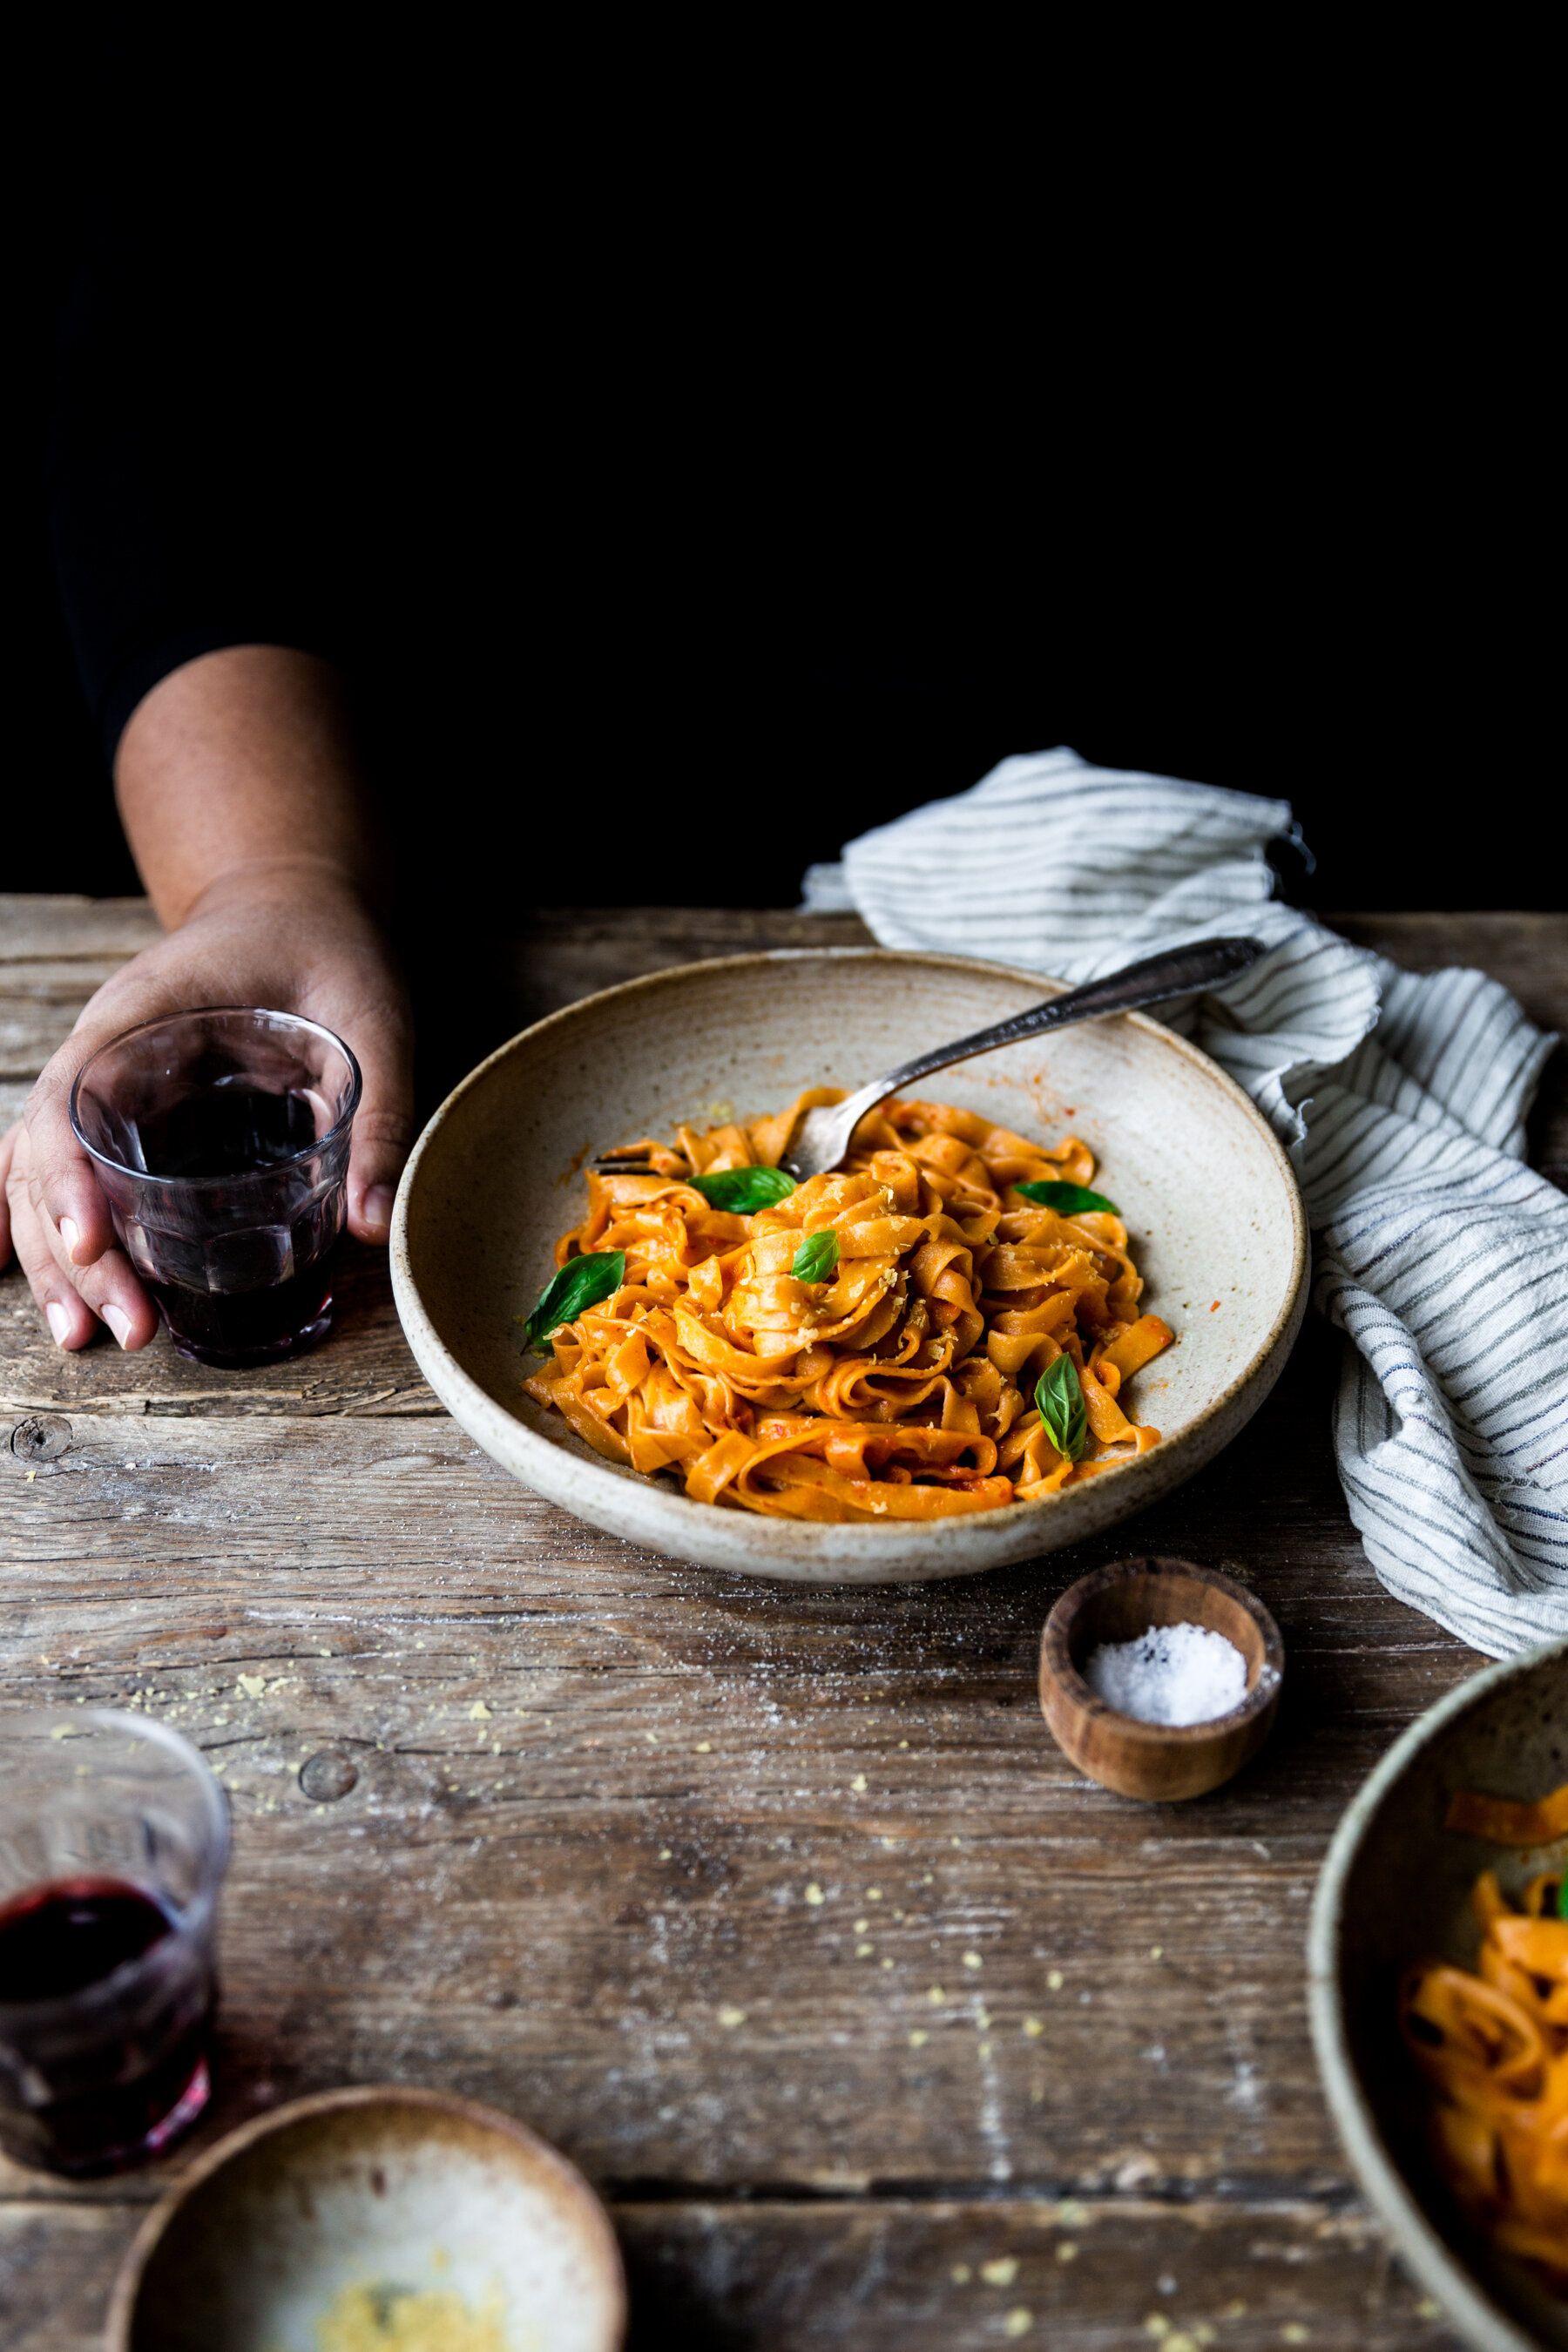 Vegan Homemade Eggless Pasta Recipe A Vegan Food Photography And Styling Blog In 2020 Vegan Food Photography Vegan Pasta Recipes Homemade Food Photography